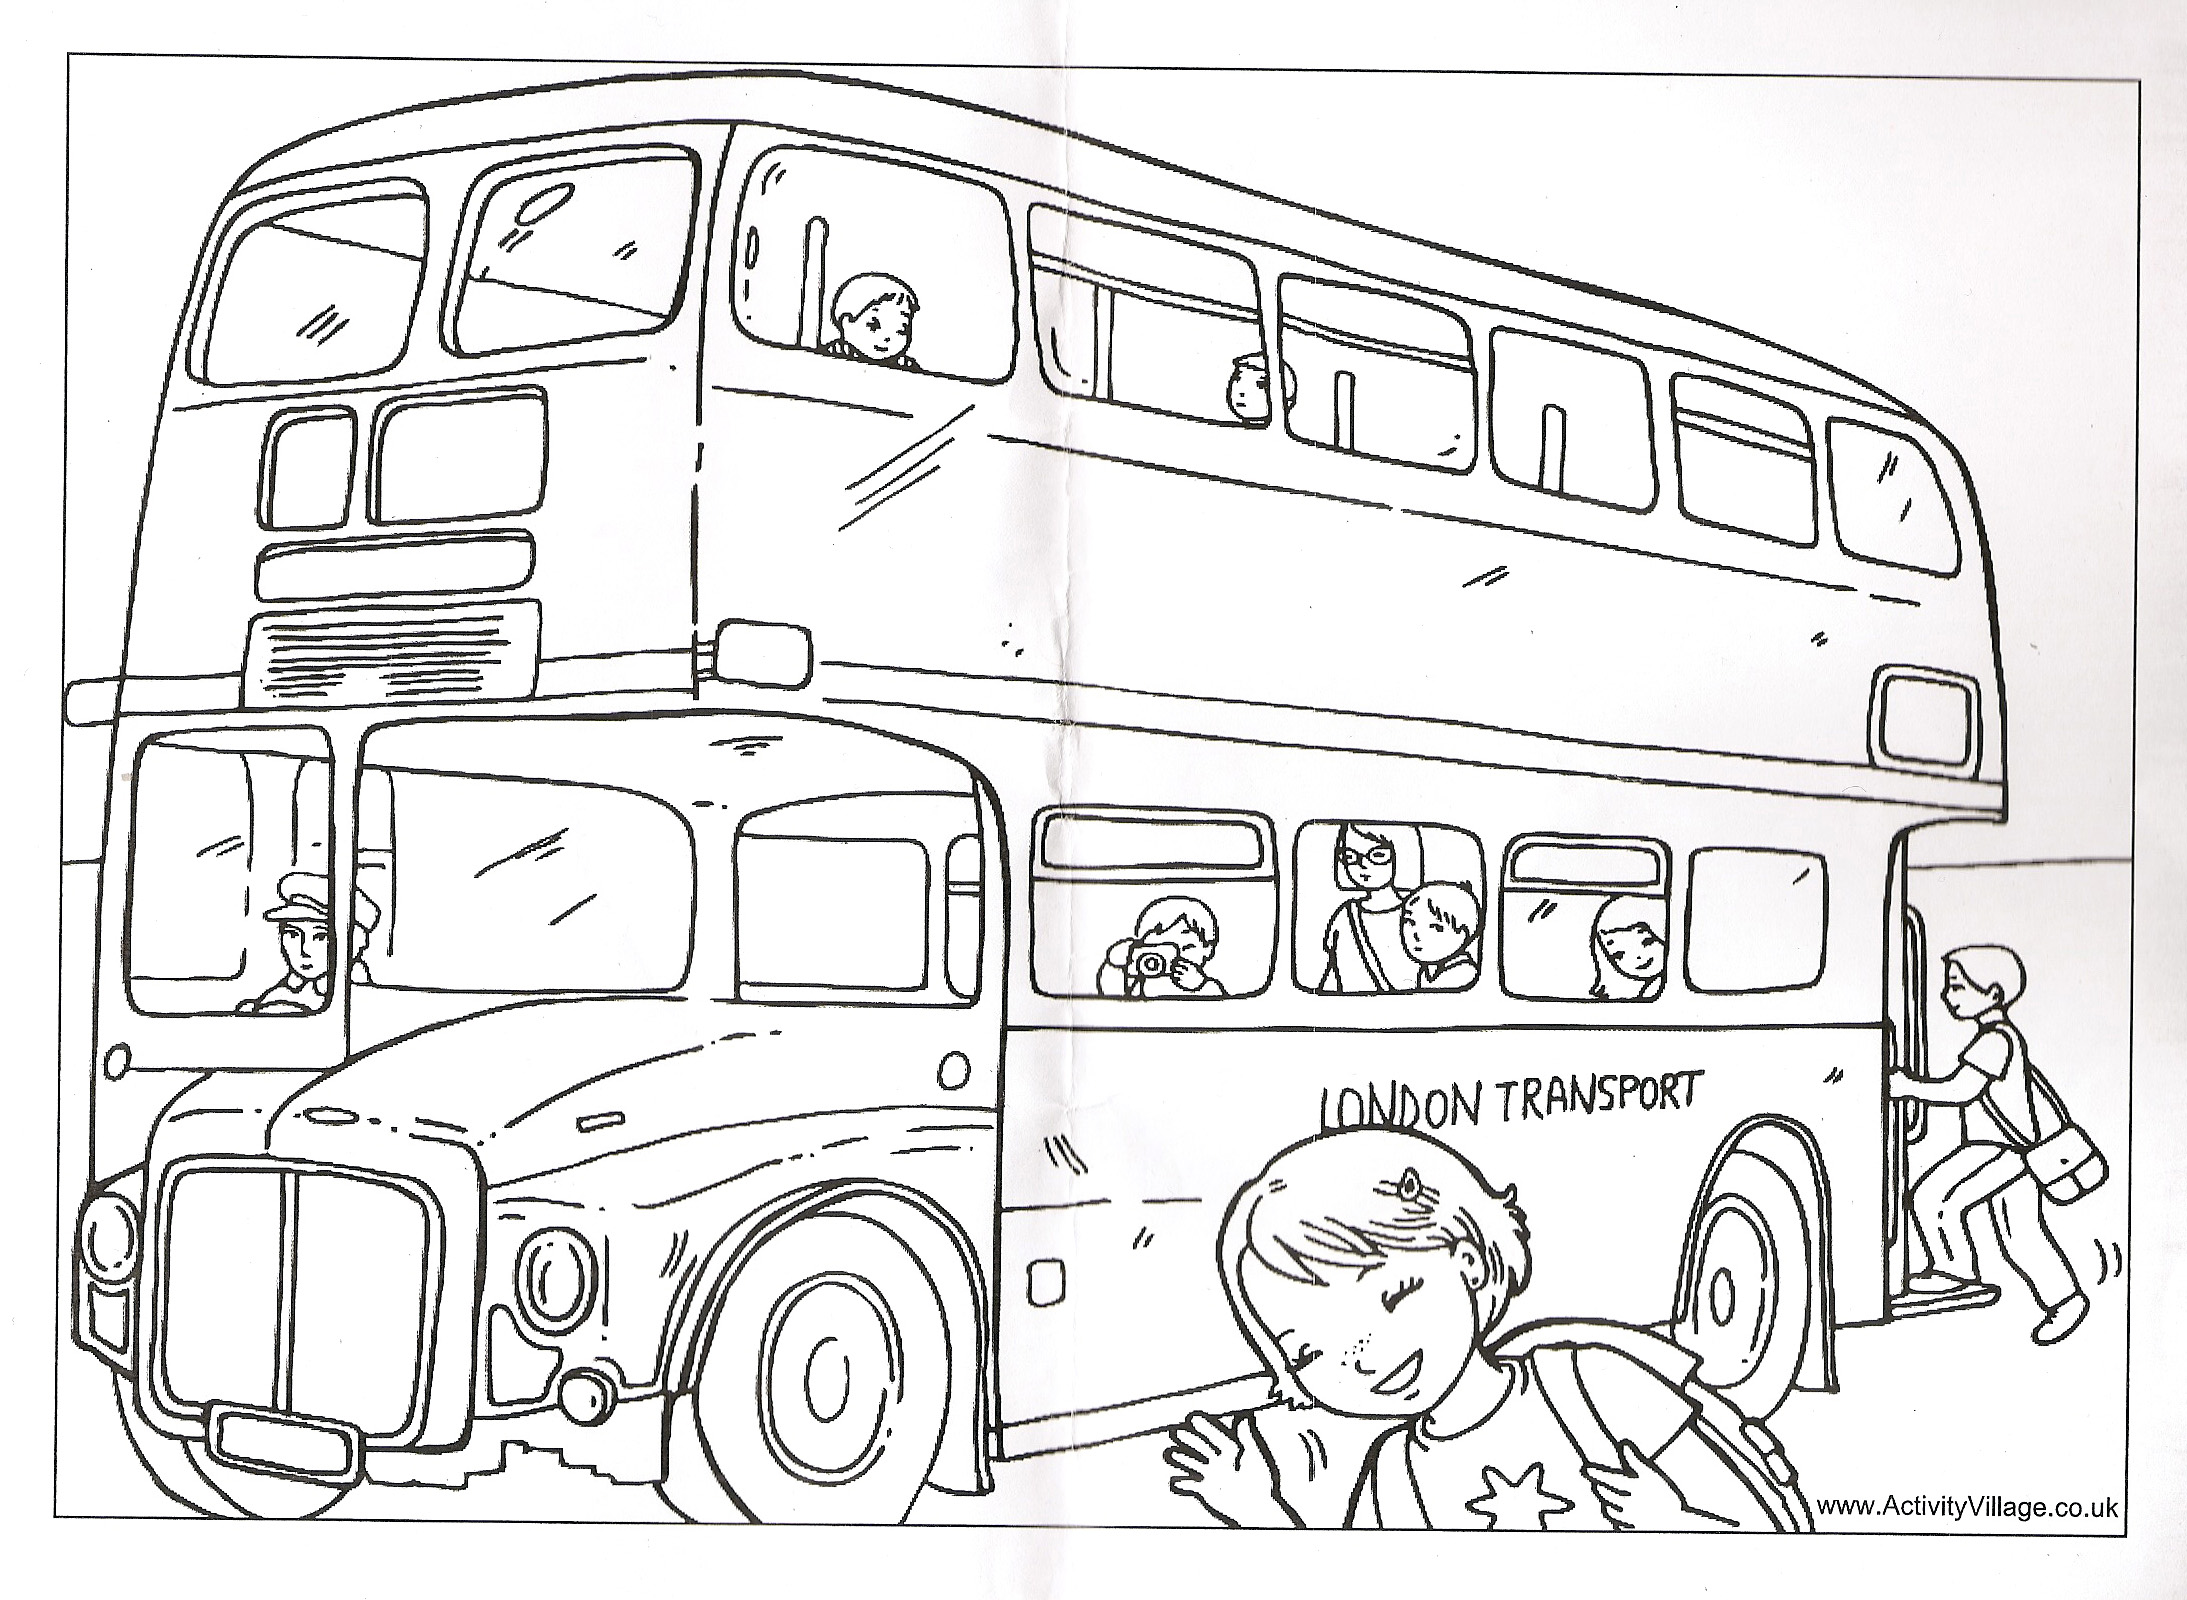 100 Years of Merton Bus Garage